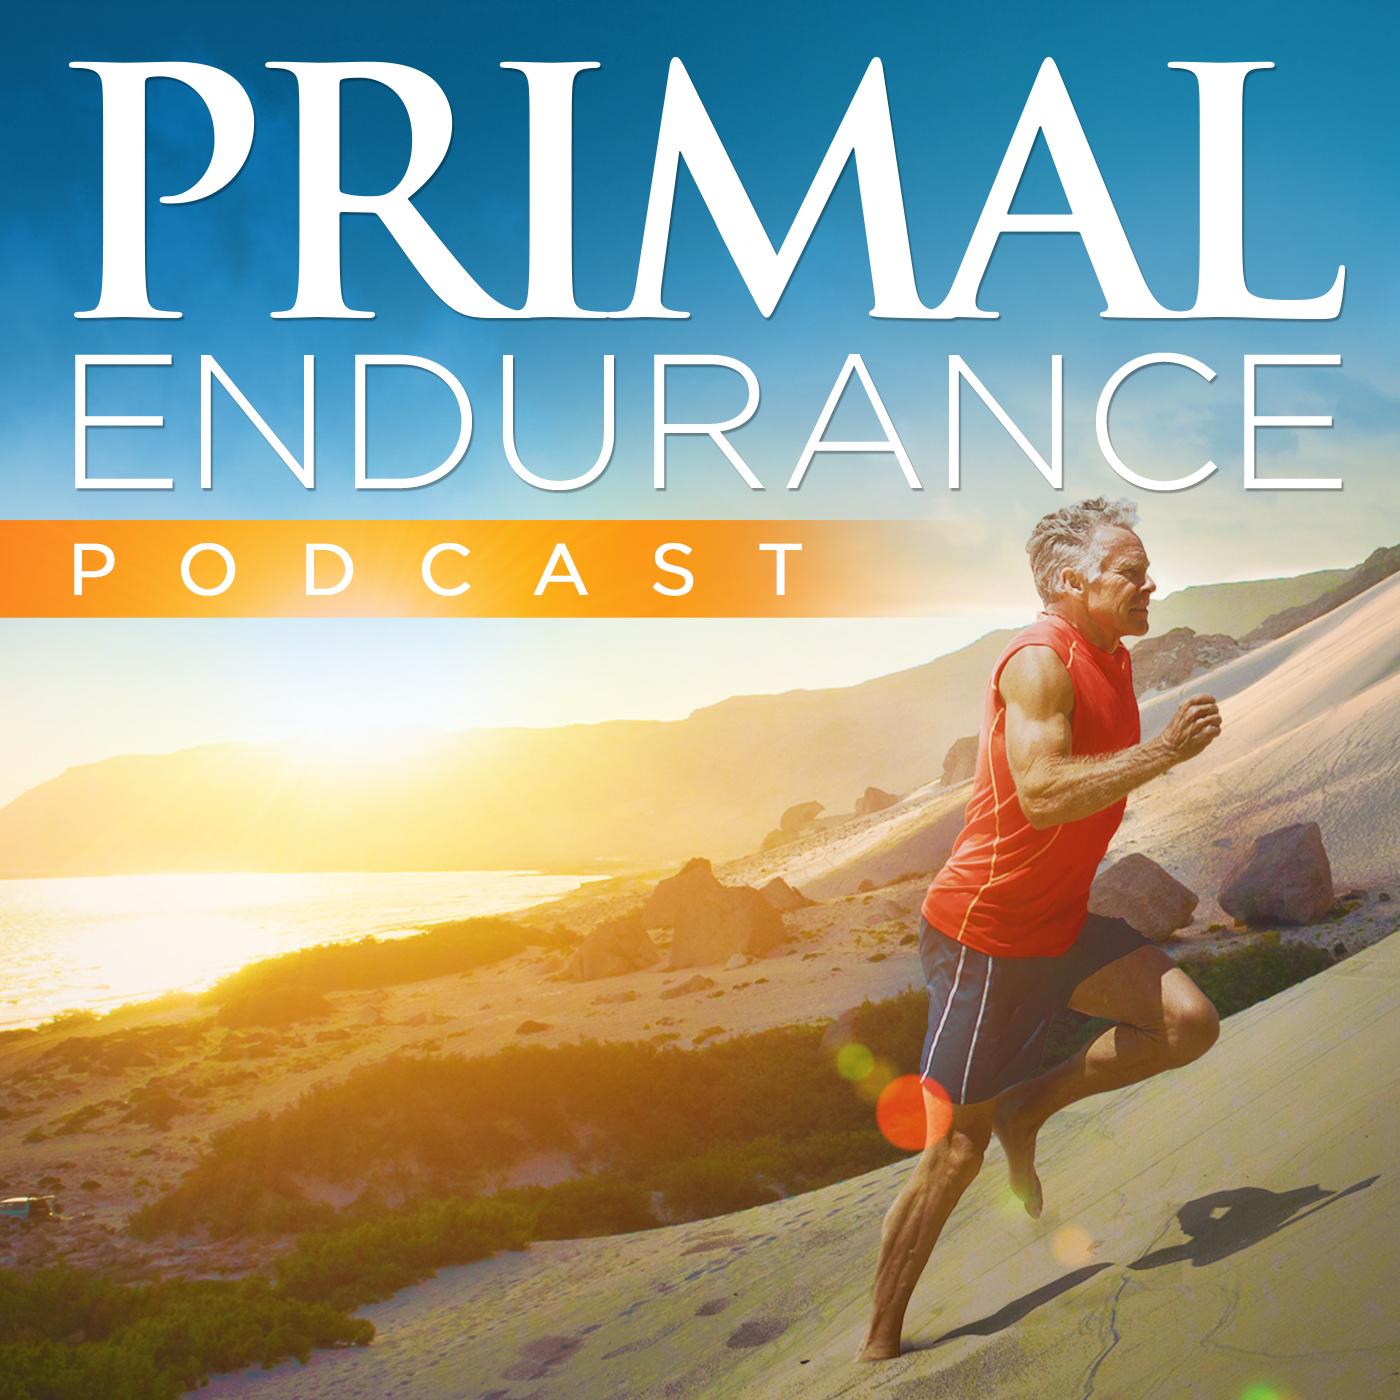 Primal Endurance Podcast show art